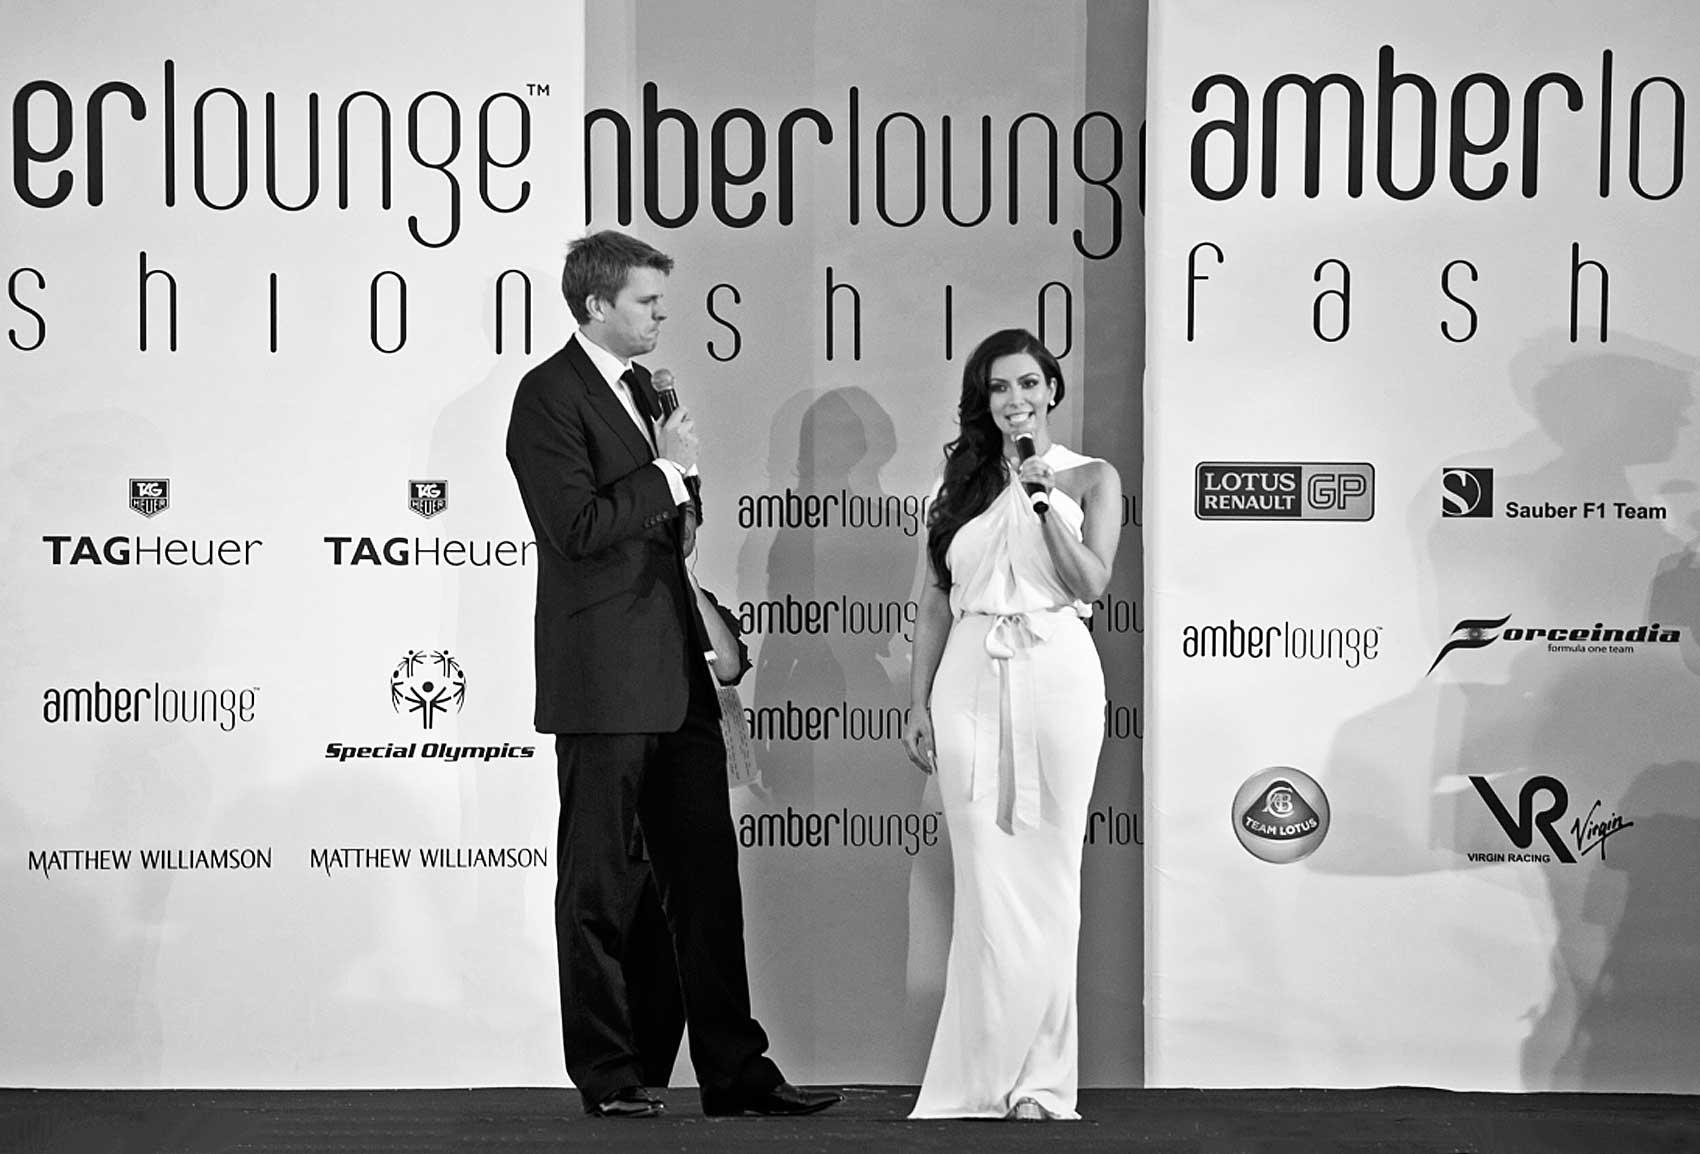 jake-humphrey-and-kim-kardashian-presenting-at-amber-lounge-charity-auction